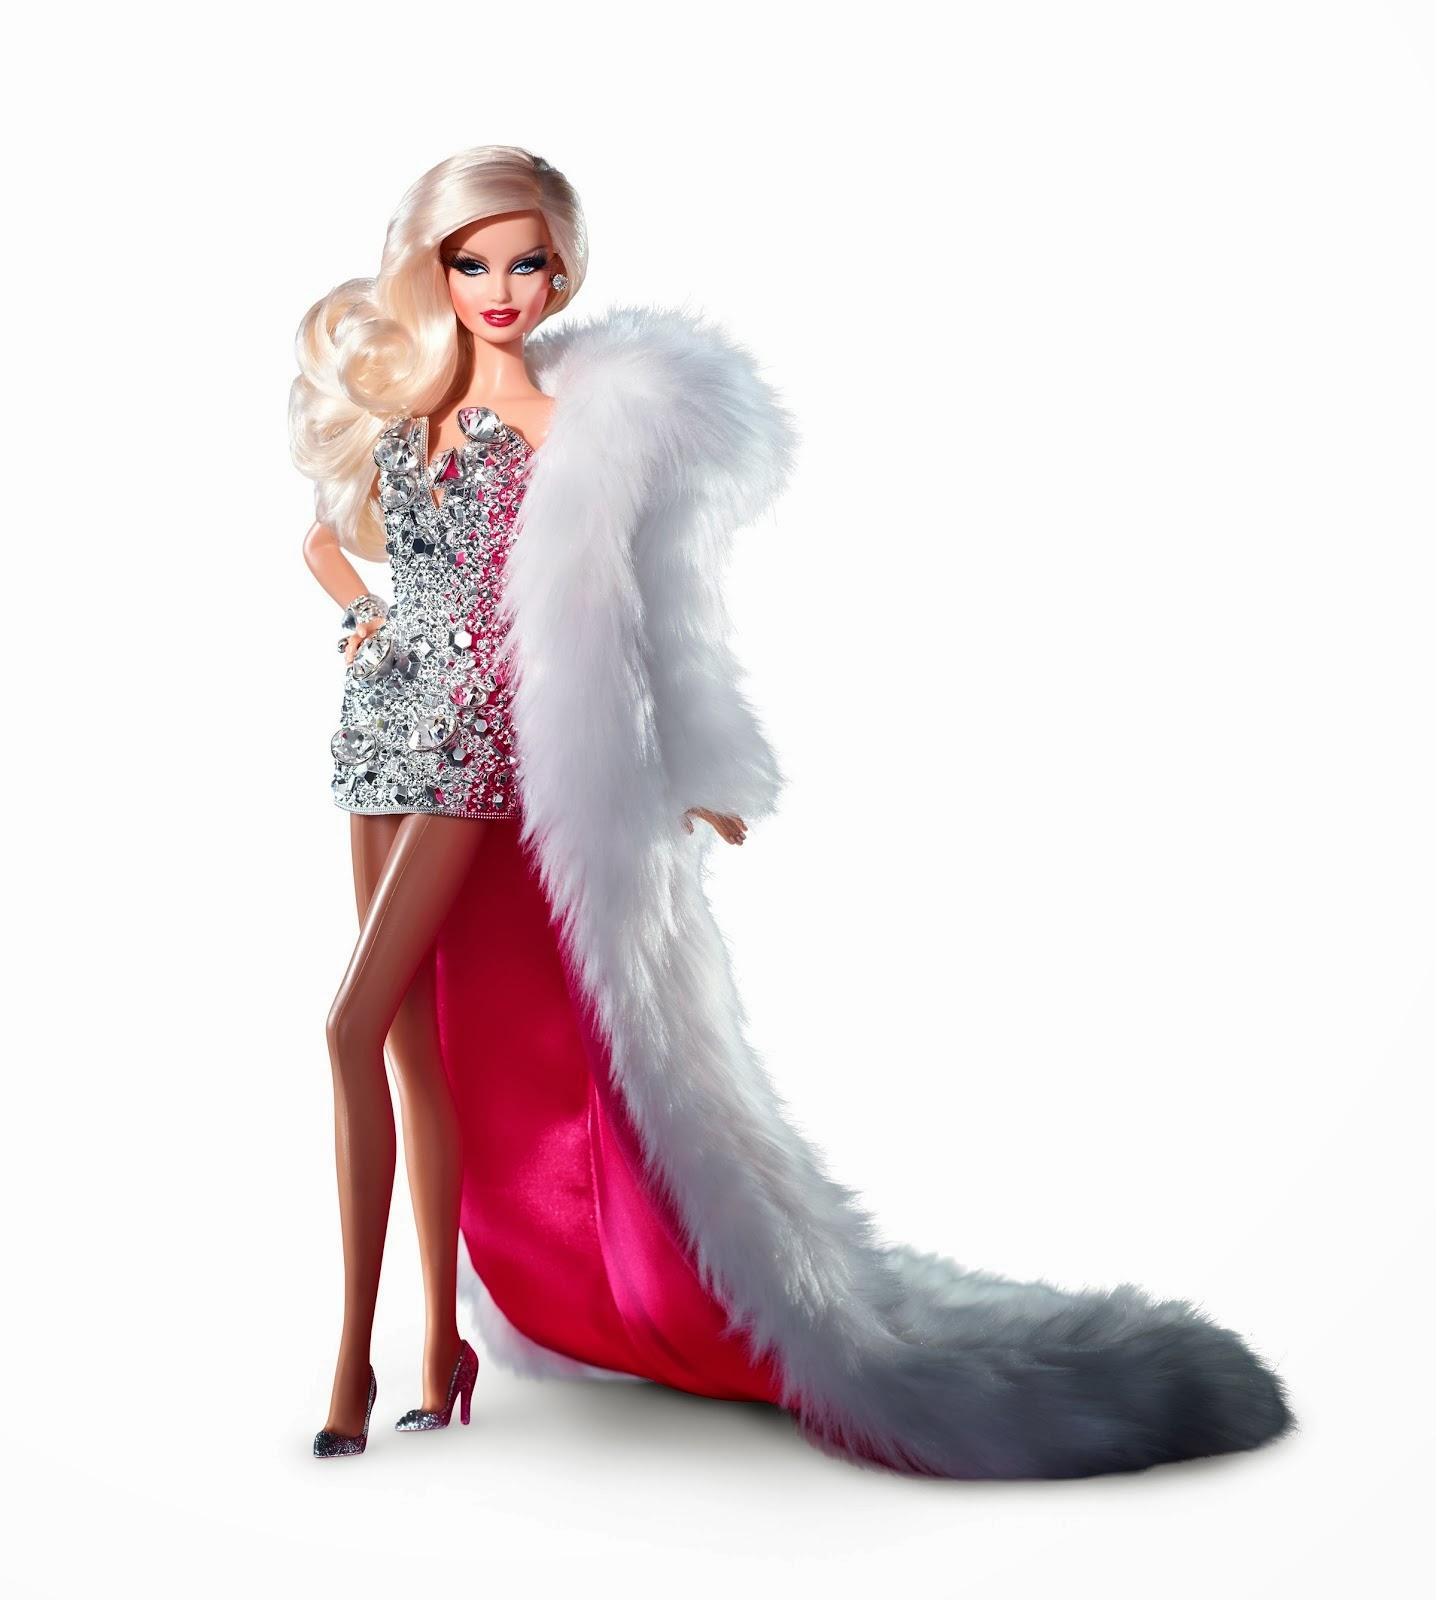 Barbie Wallpaper Hd 3d: Top 80 Best Beautiful Cute Barbie Doll HD Wallpapers